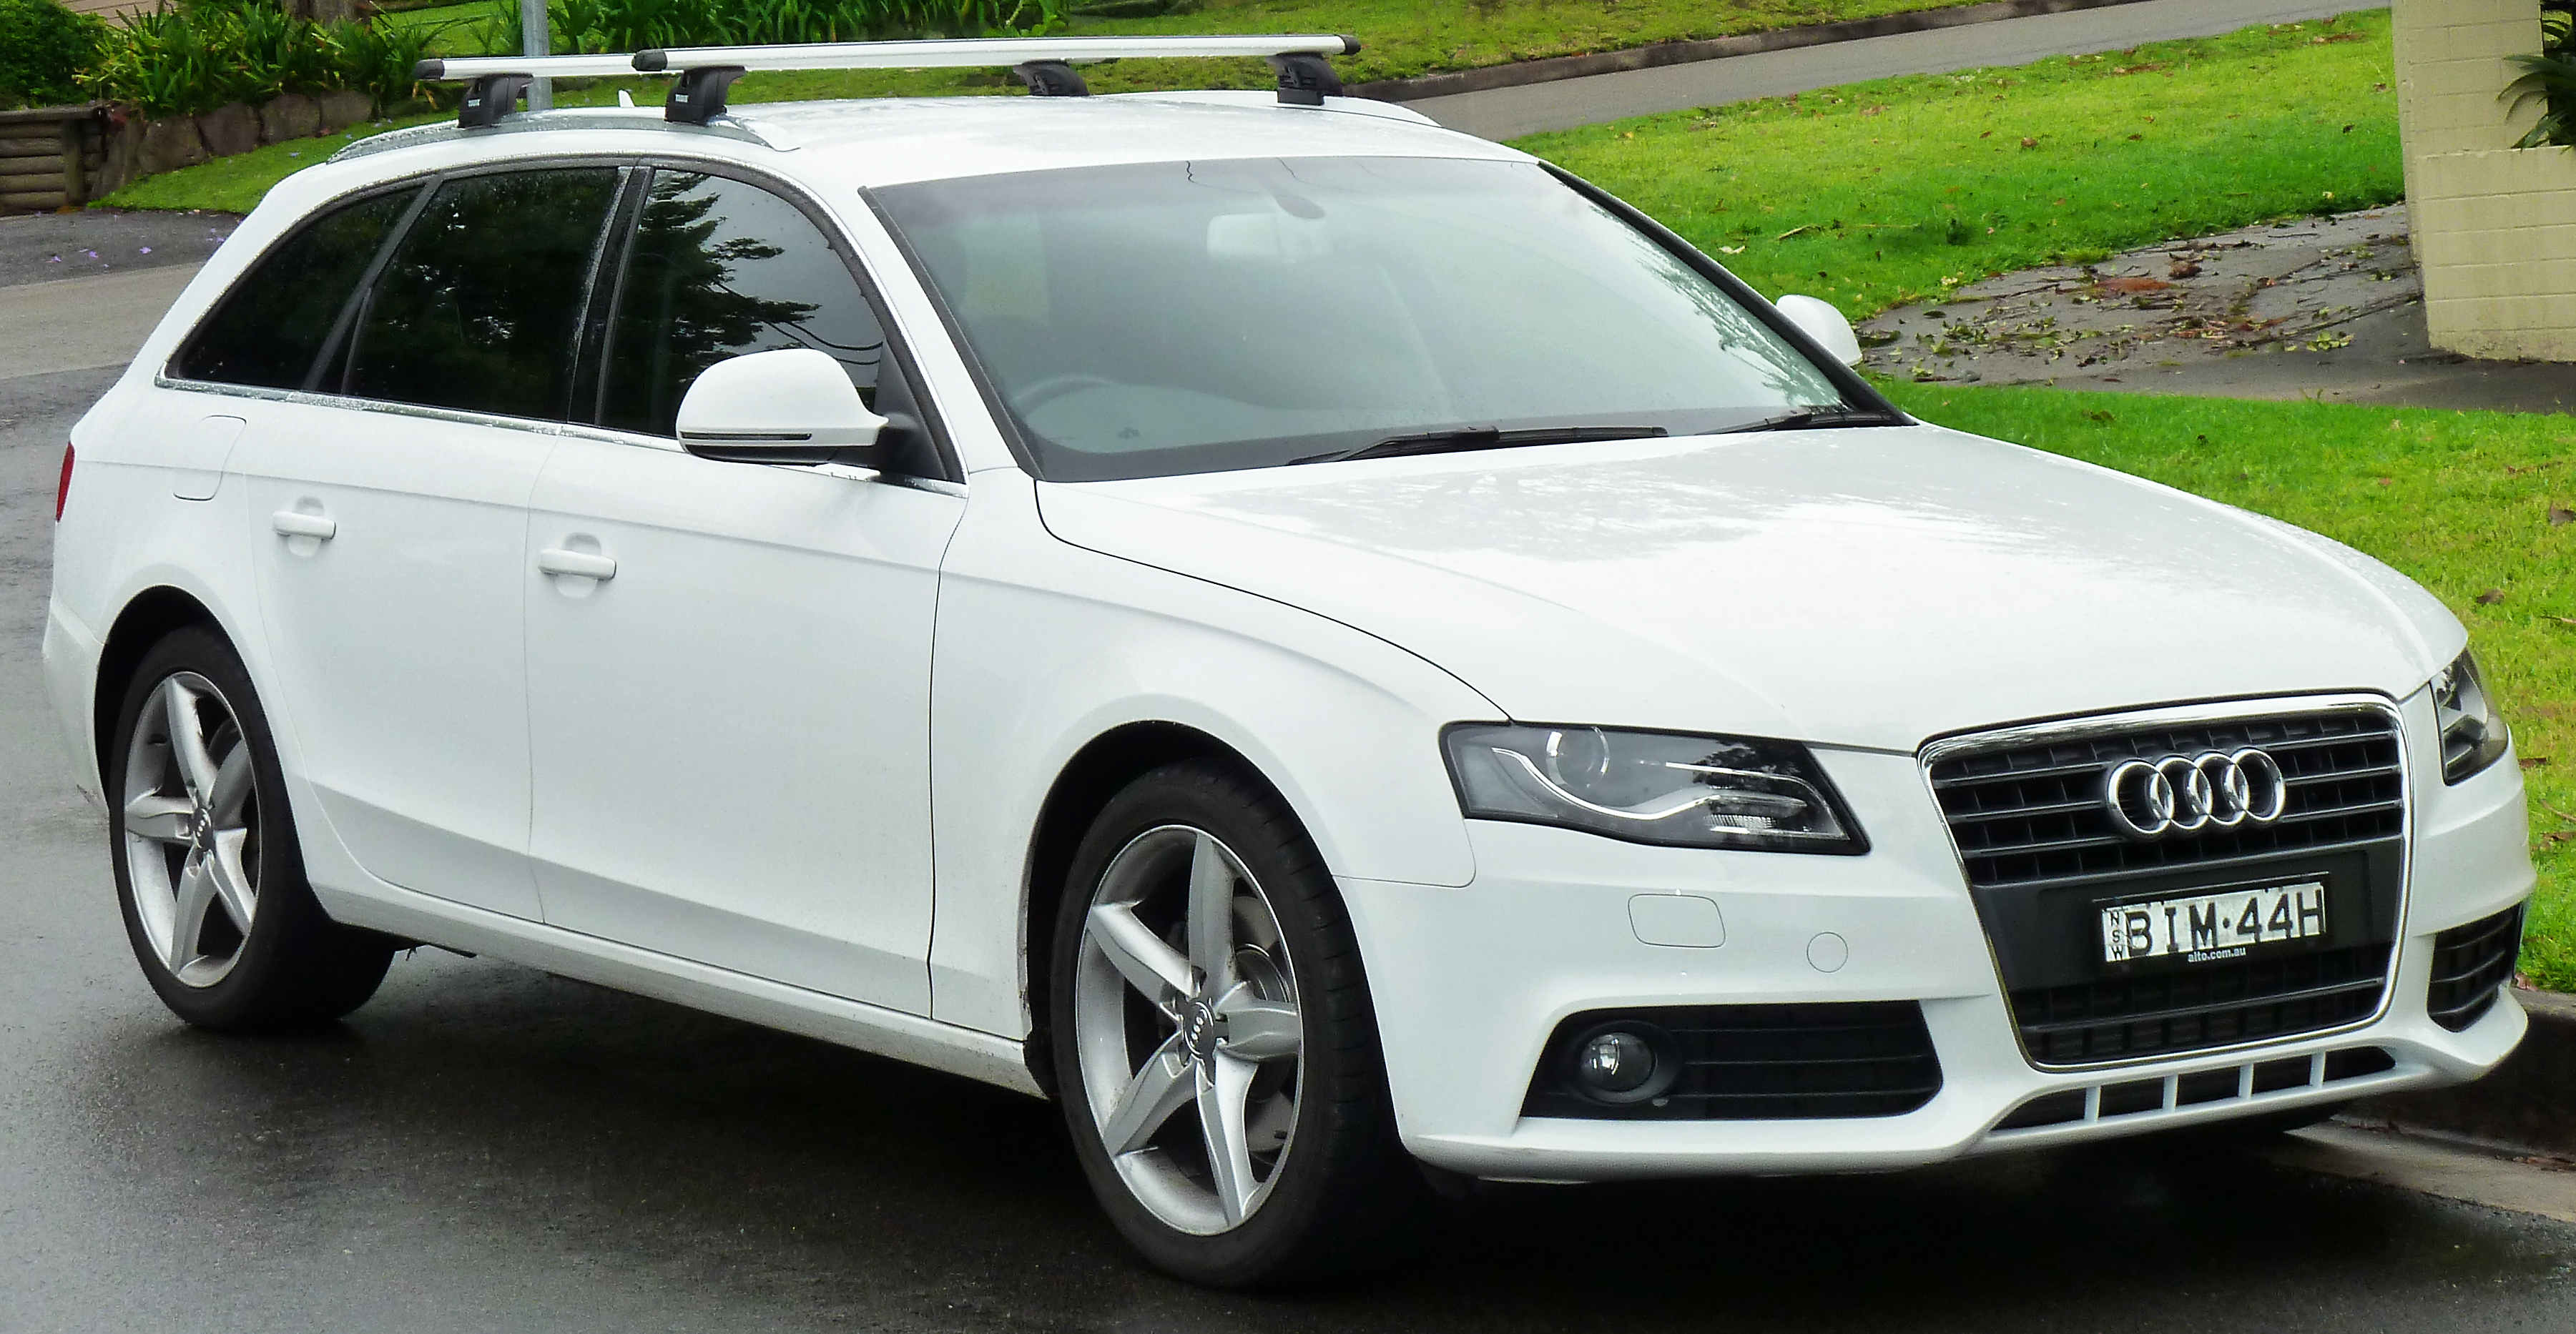 File 2008 2011 Audi A4 8k 2 0 Tdi Avant 2011 11 17 Jpg